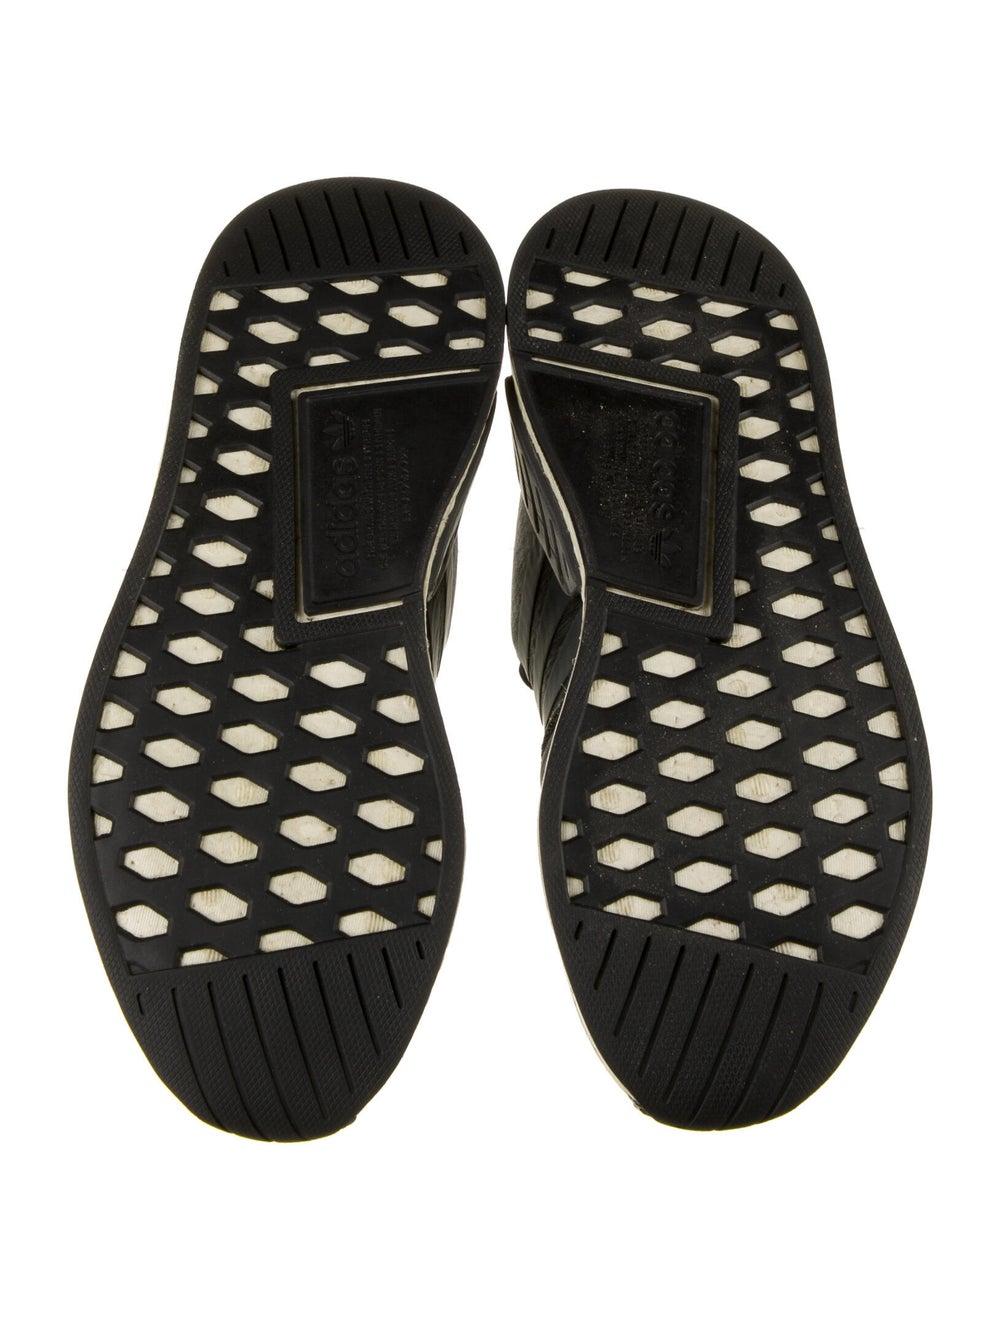 Adidas Athletic Sneakers Grey - image 5